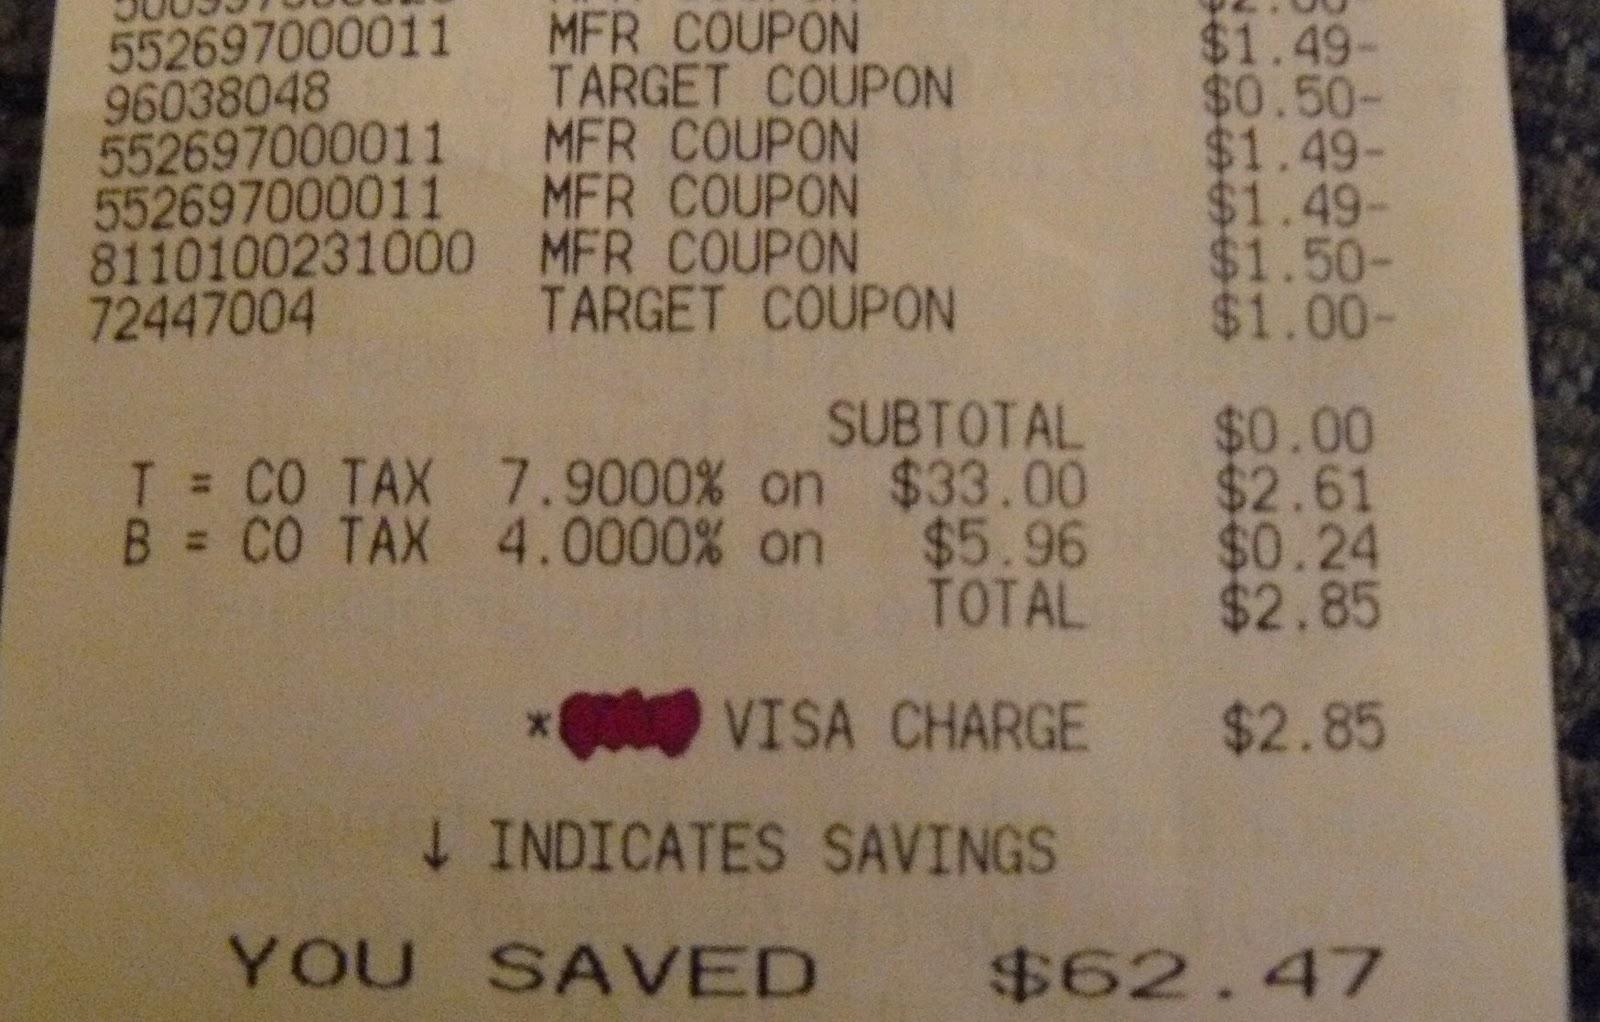 Vici coupon code